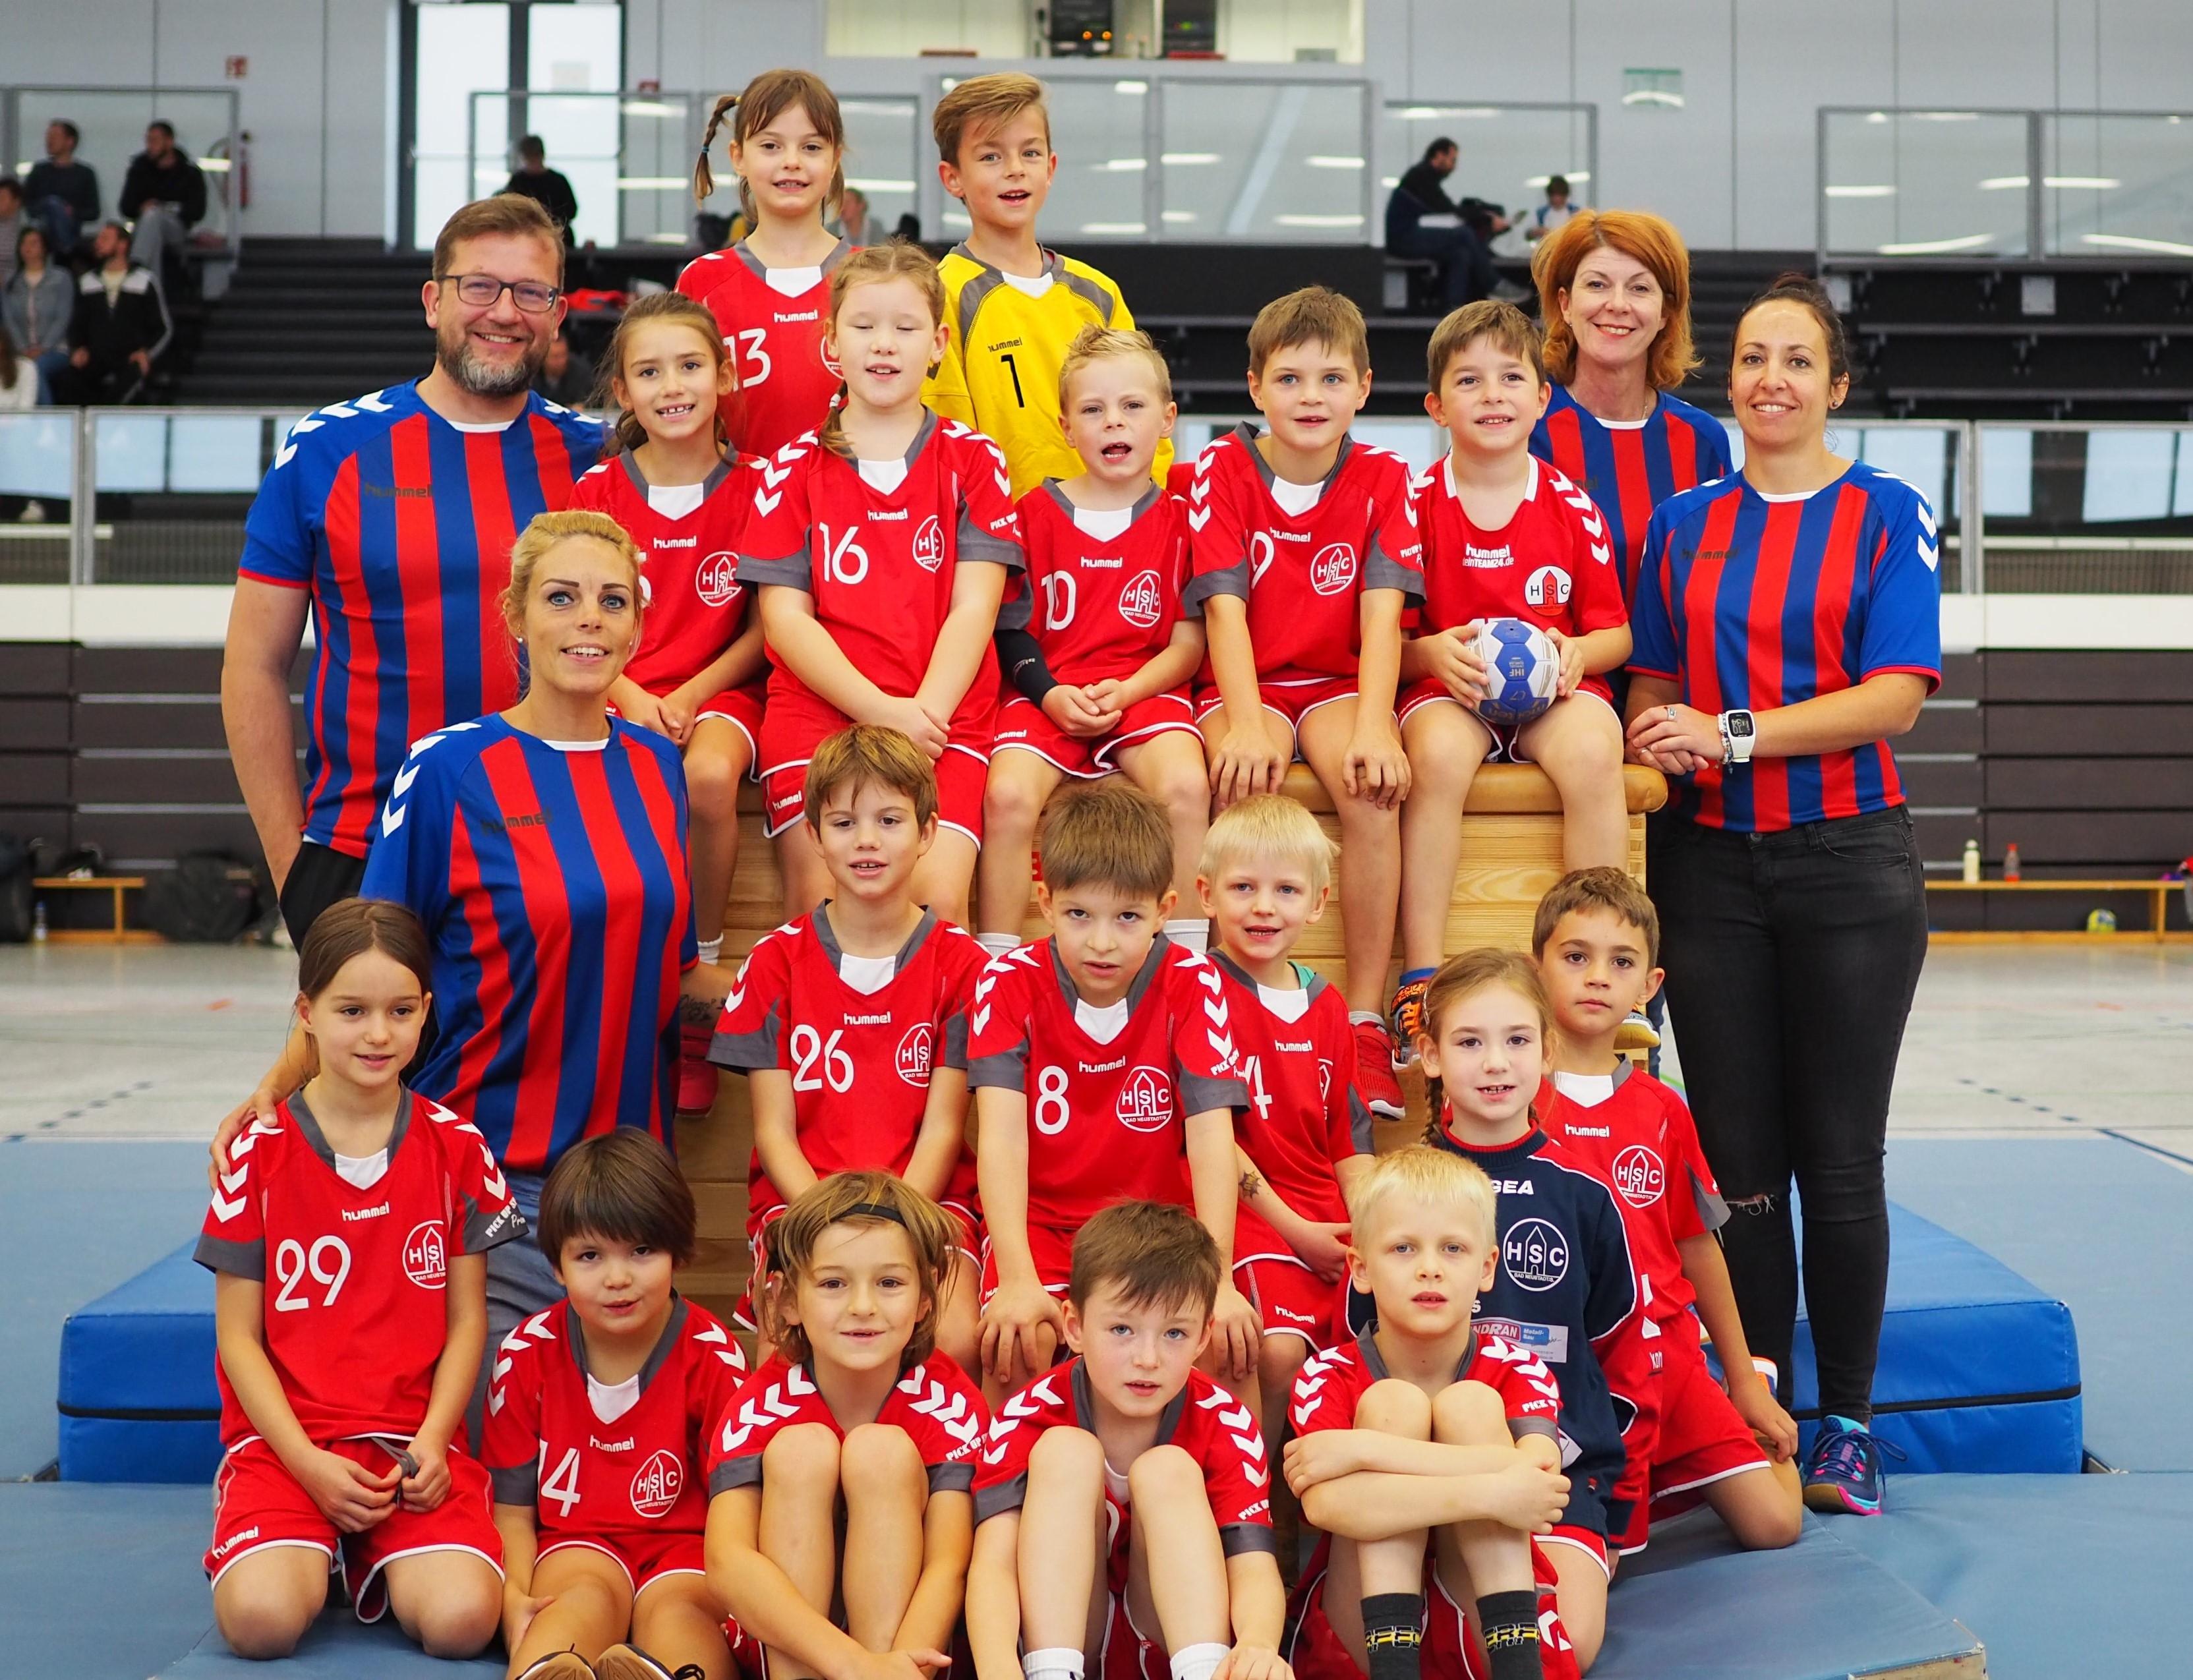 """Handball statt Schule am Buß- und Bettag"""